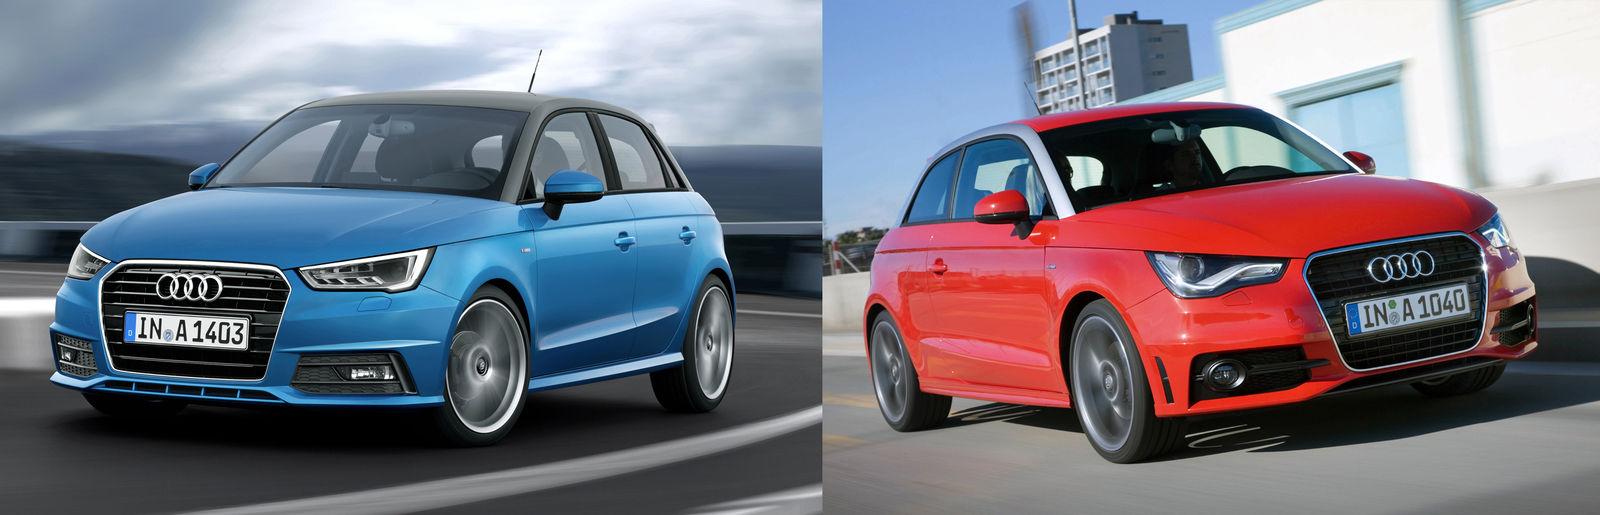 Audi A1 Price Usa >> Facelift Audi A1 2014.html | Autos Post